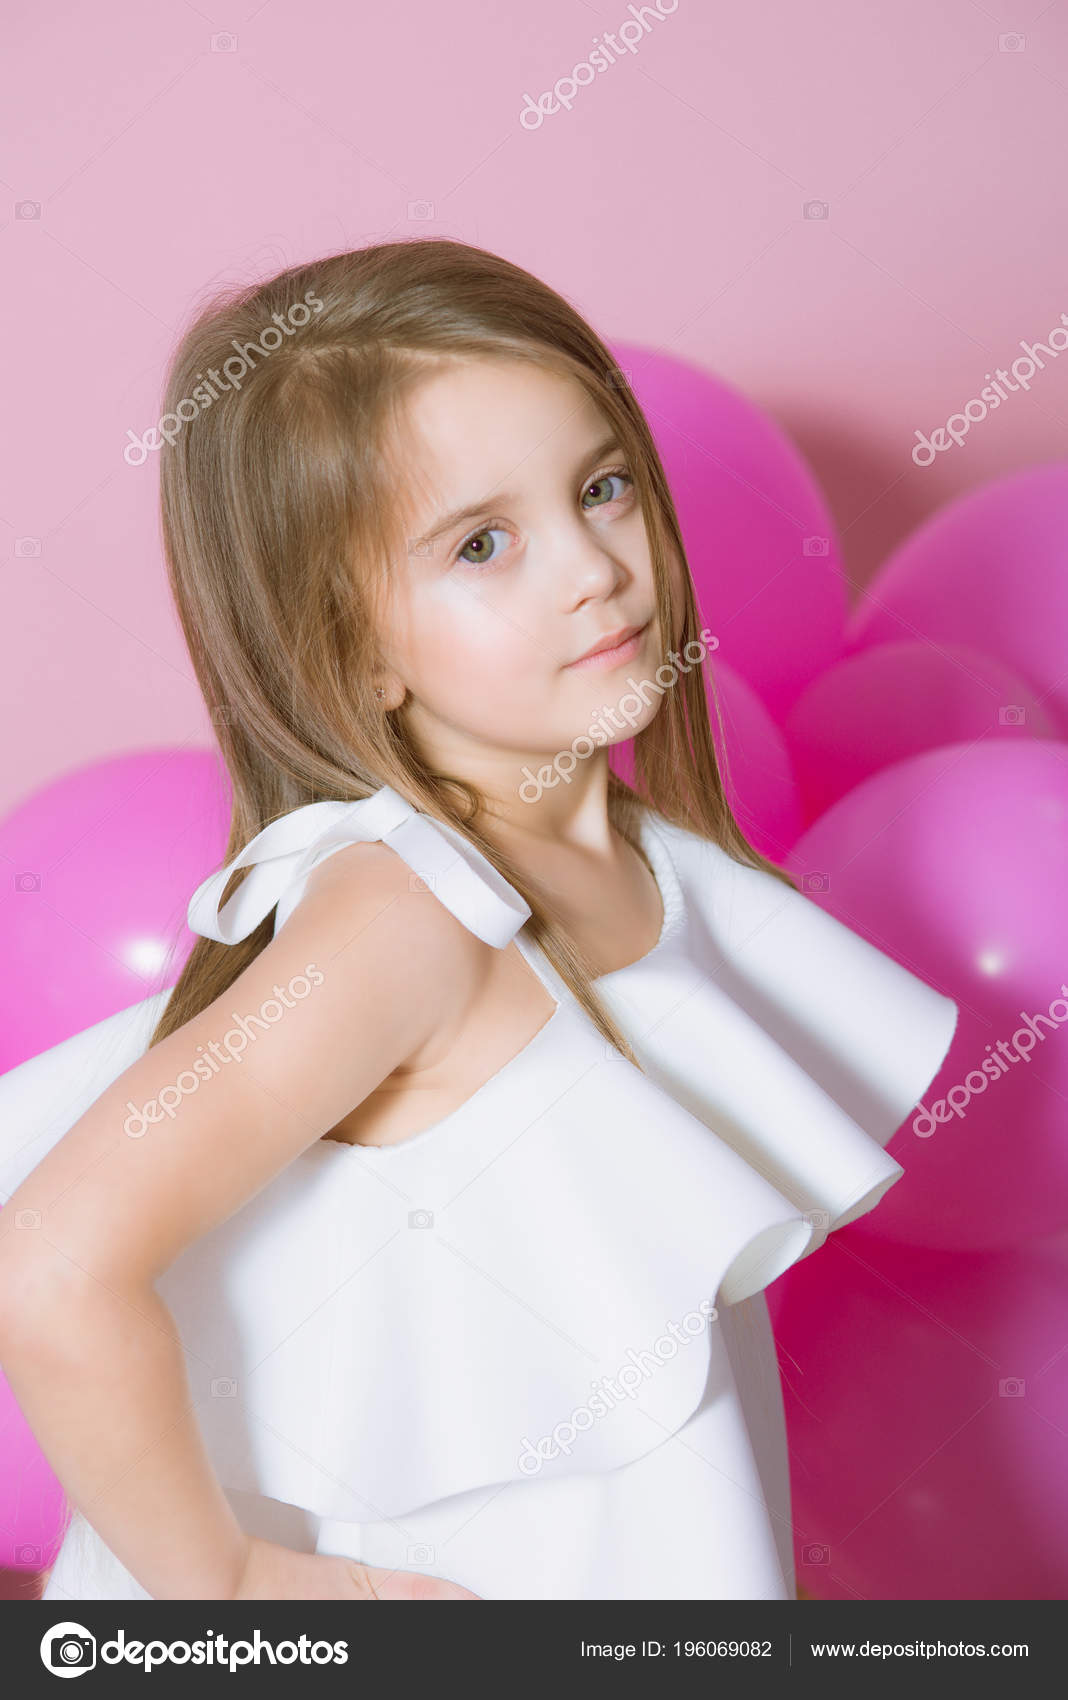 9ff7db86d Pretty Little Girl Beautiful Blonde Hair White Dress Alluring Pink ...